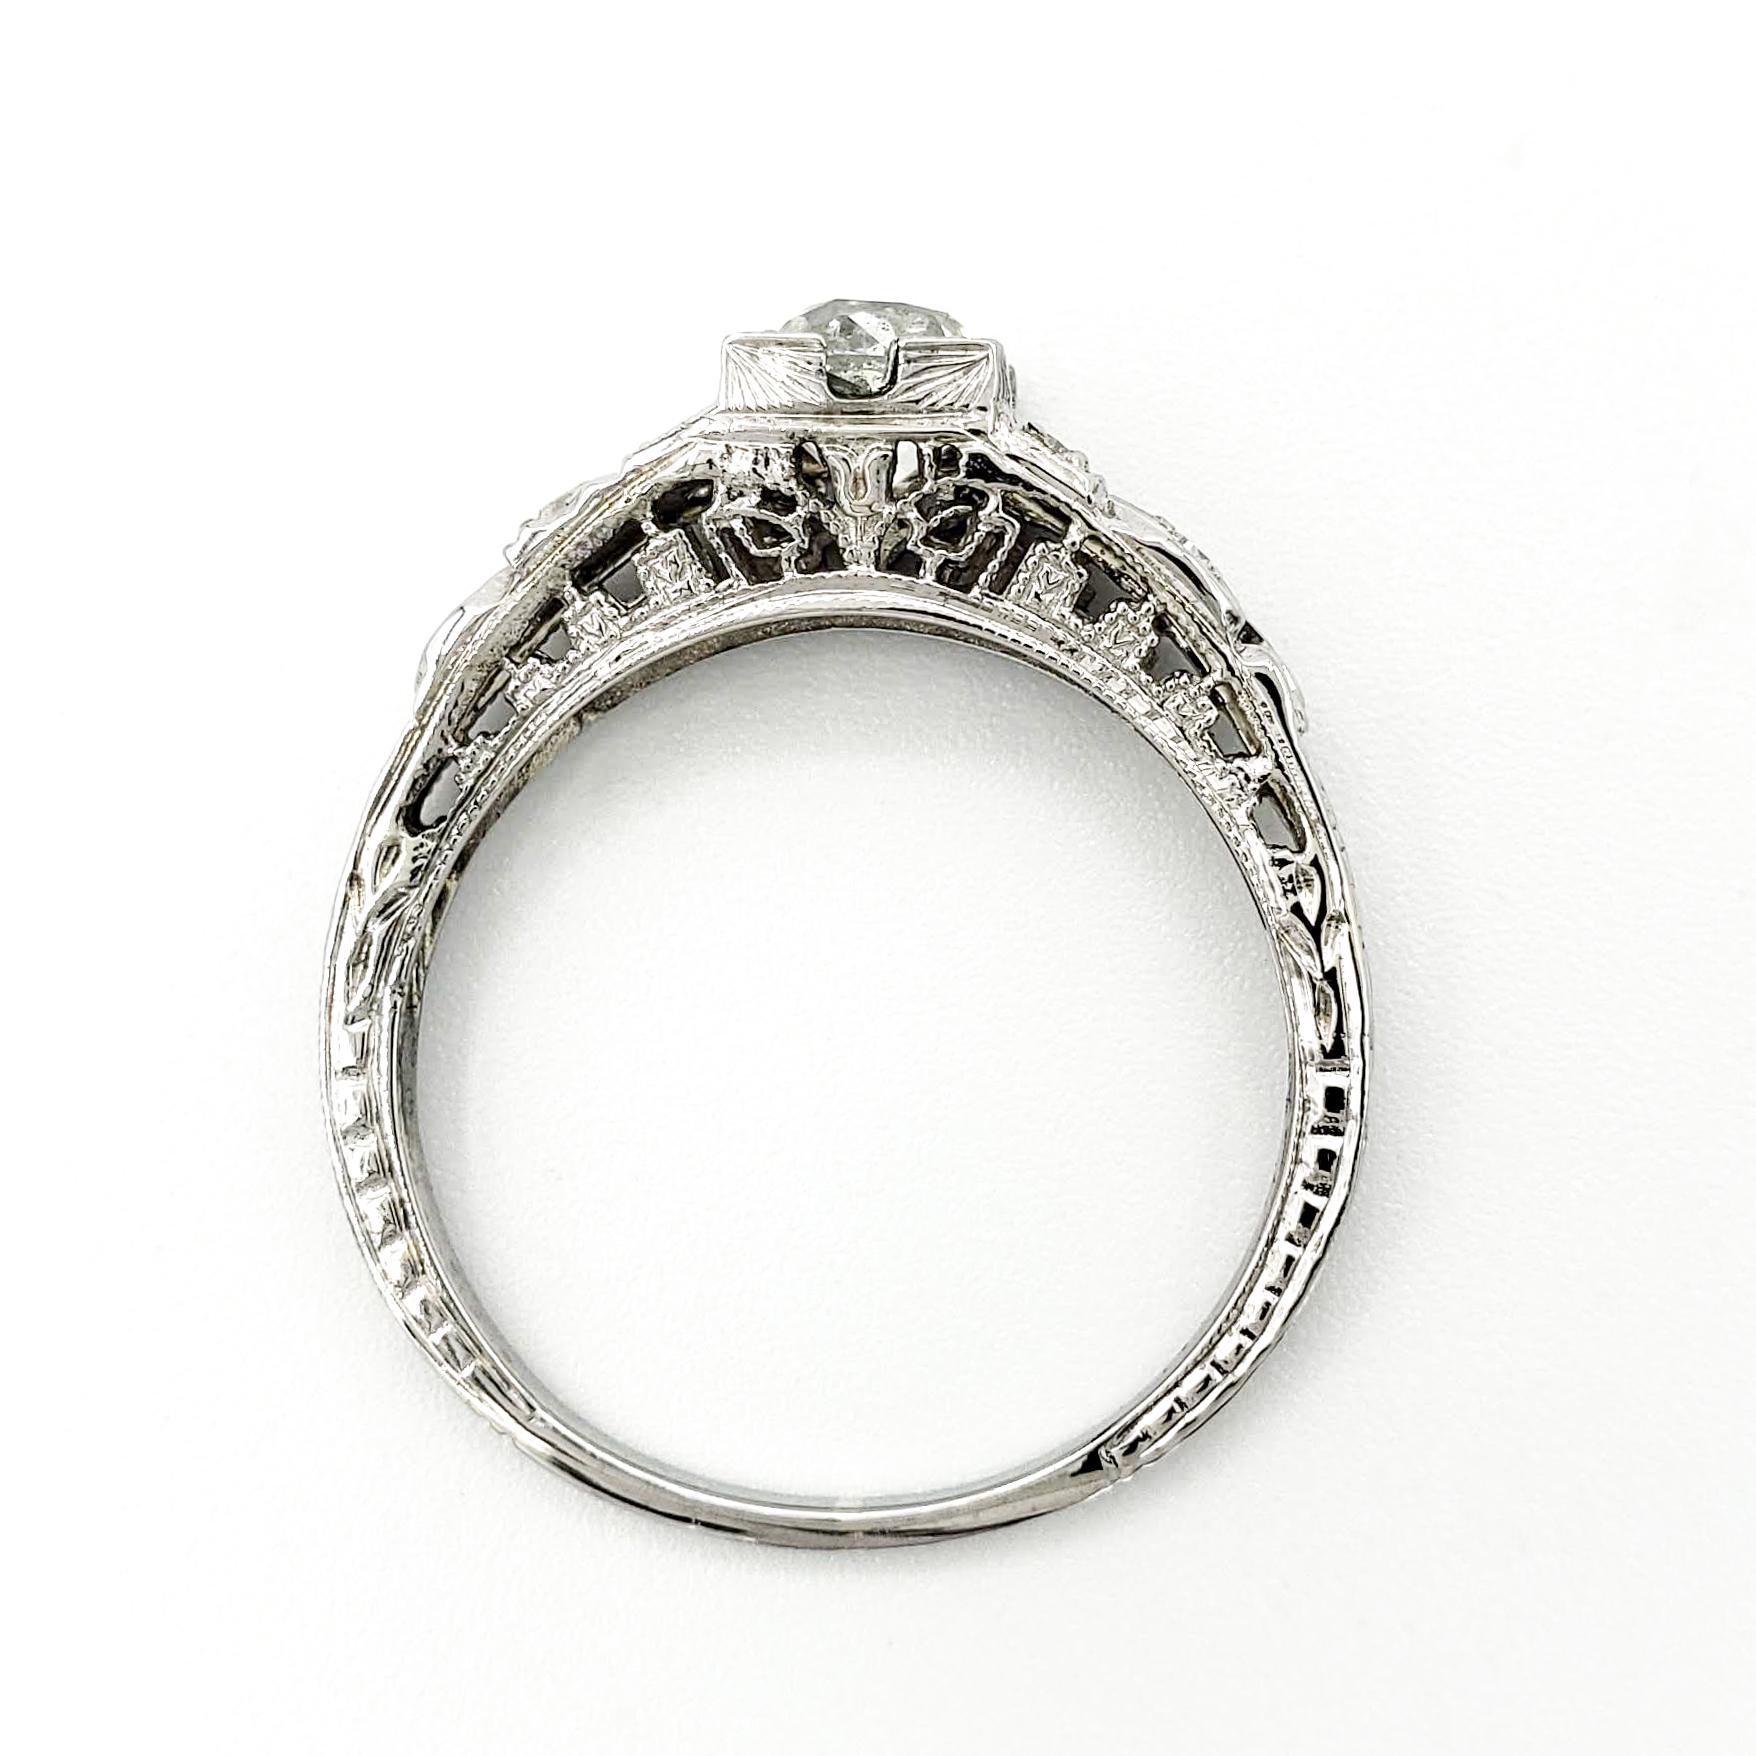 estate-platinum-engagement-ring-with-0-88-carat-old-mine-cut-diamond-gia-j-vs1